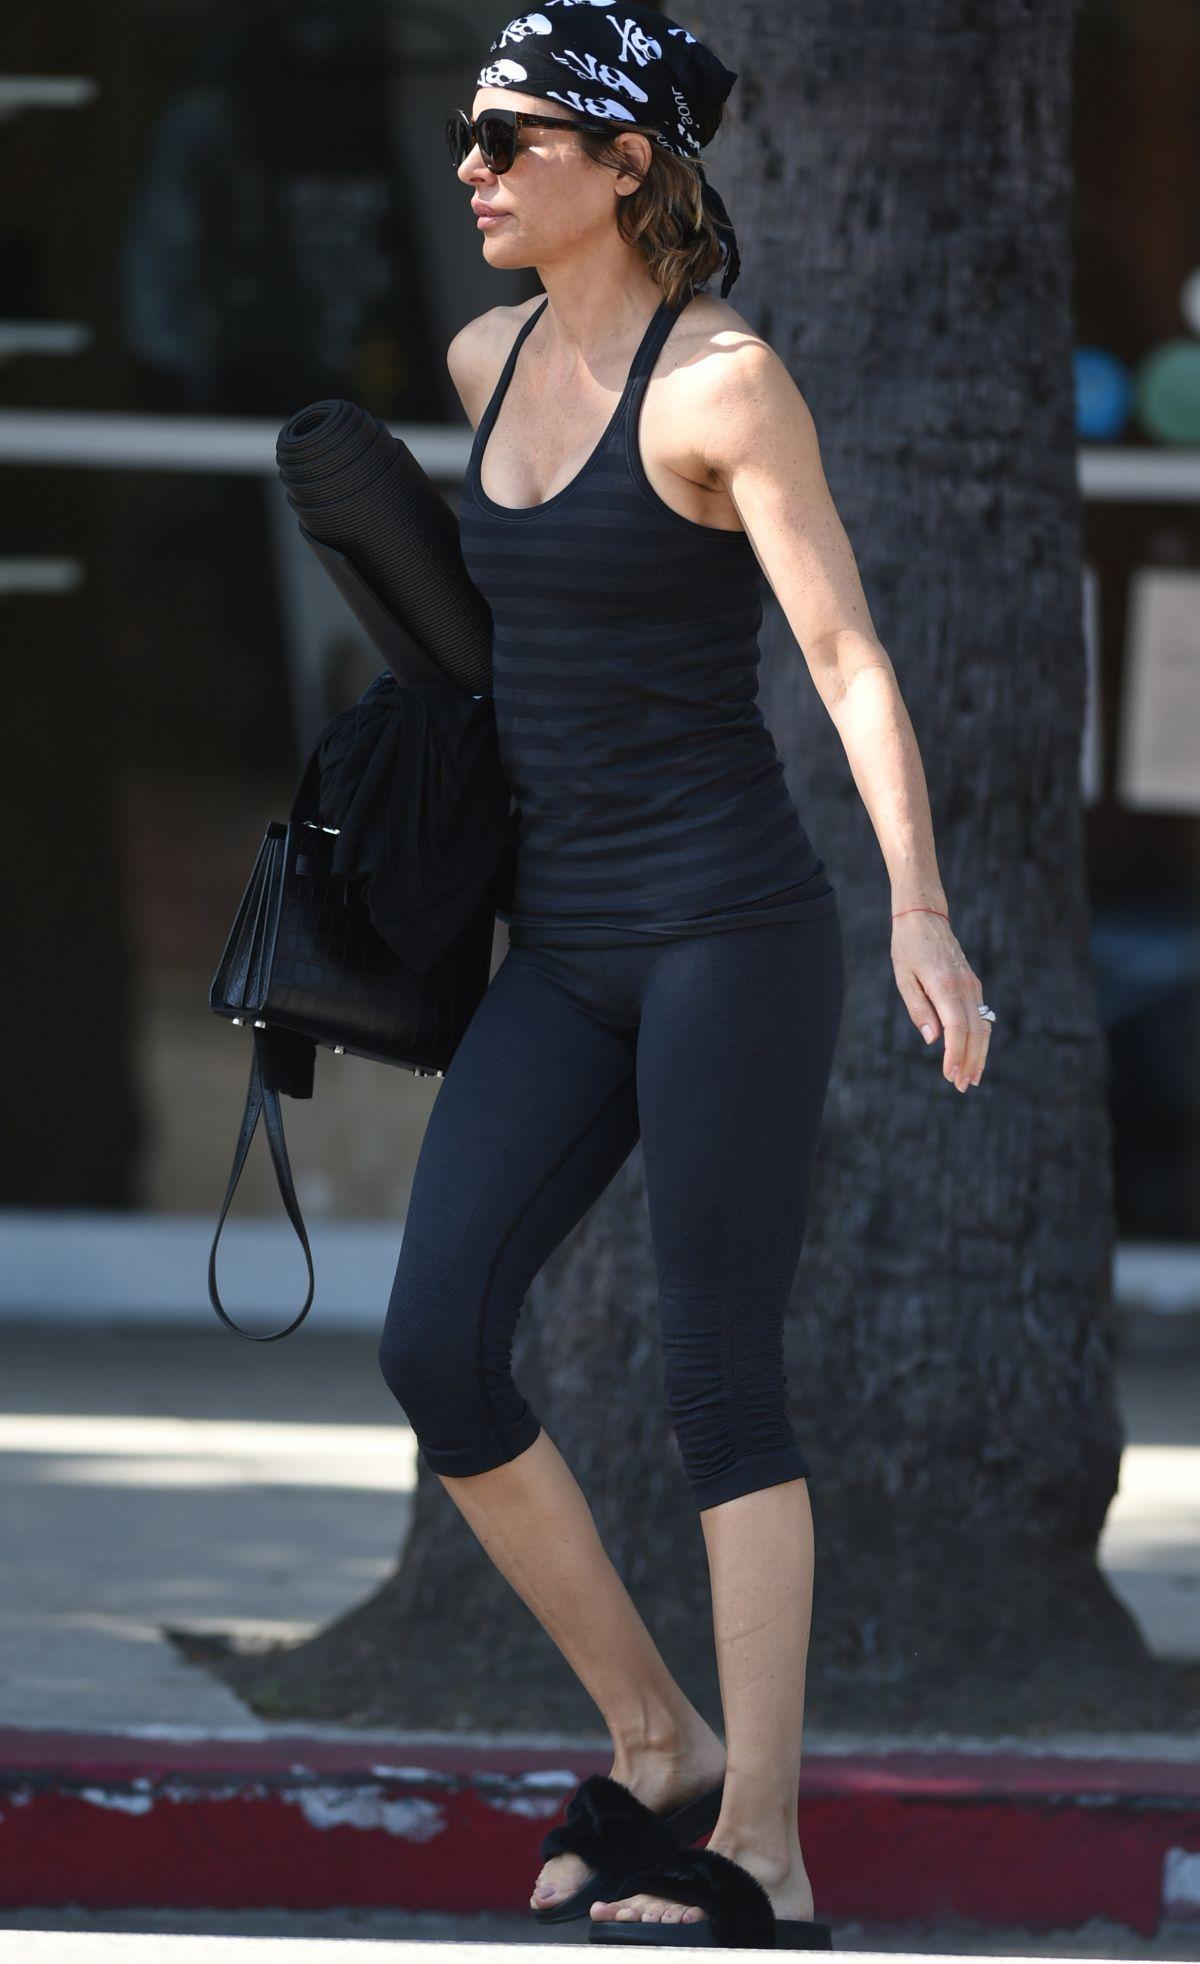 LISA RINNA Leaves Yoga Class in Los Angeles 06/09/2017